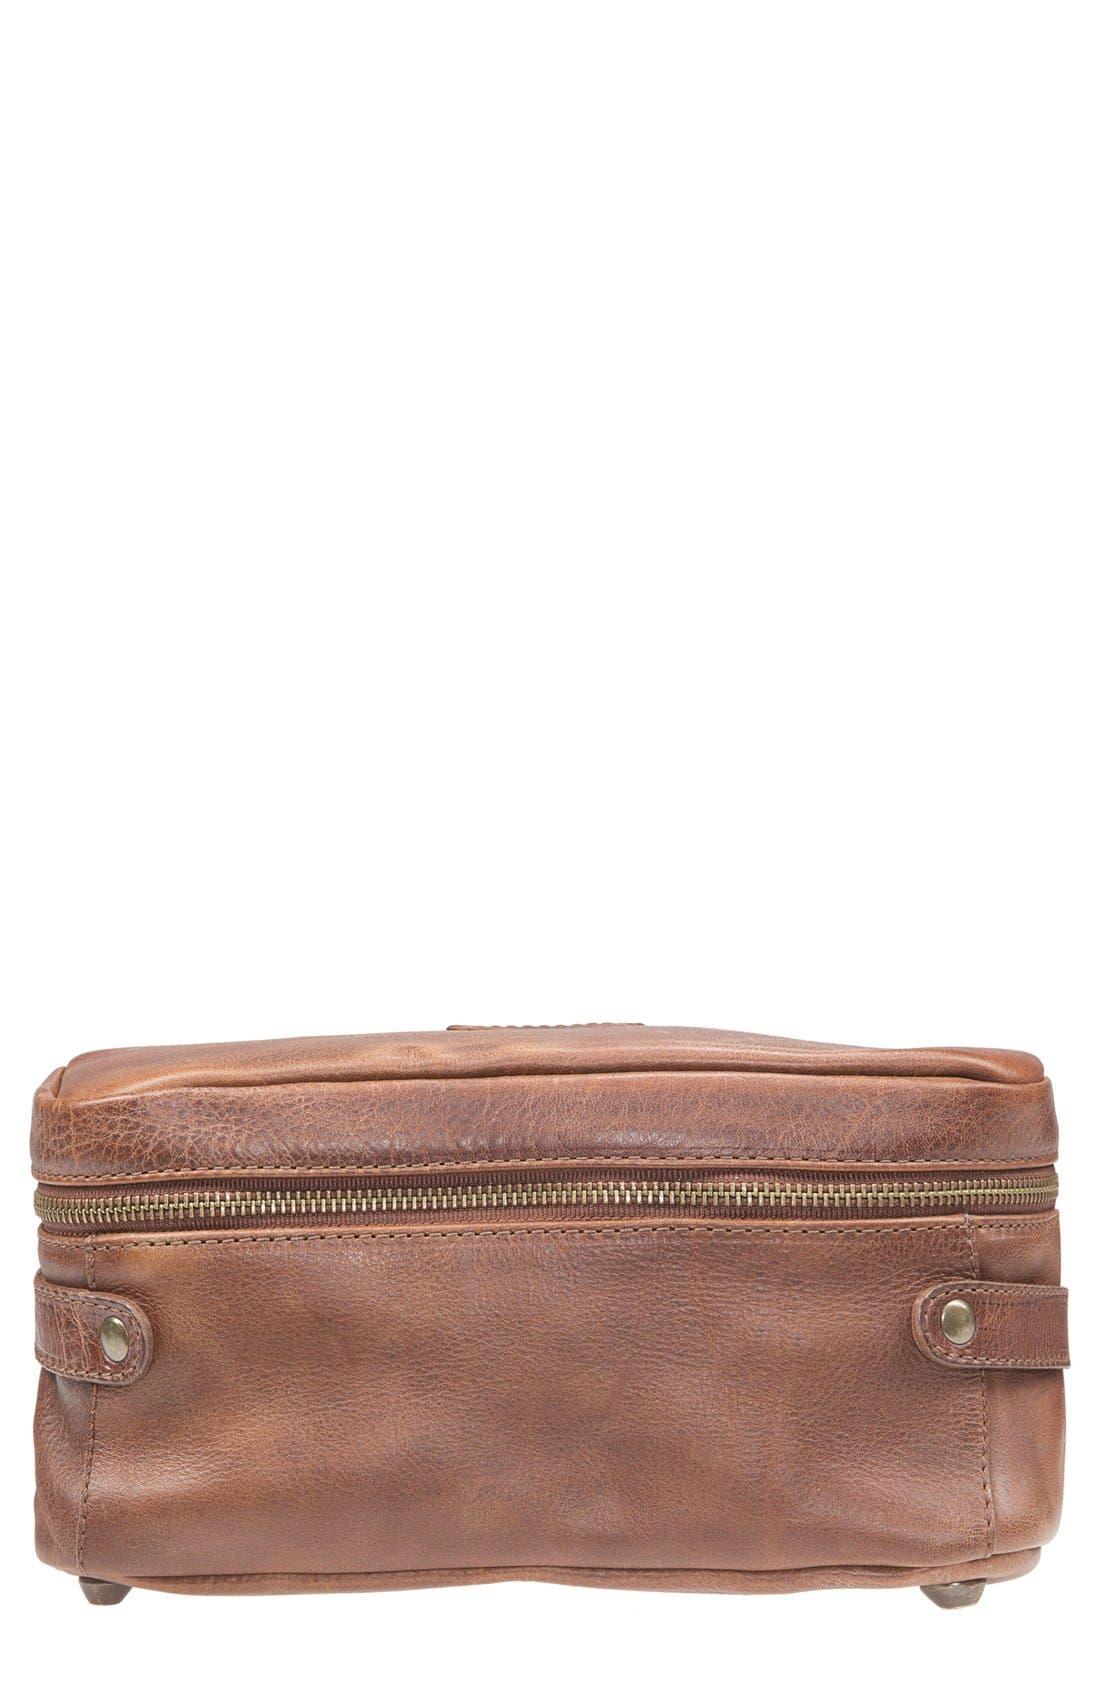 Will Leather Goods 'Desmond' Travel Kit